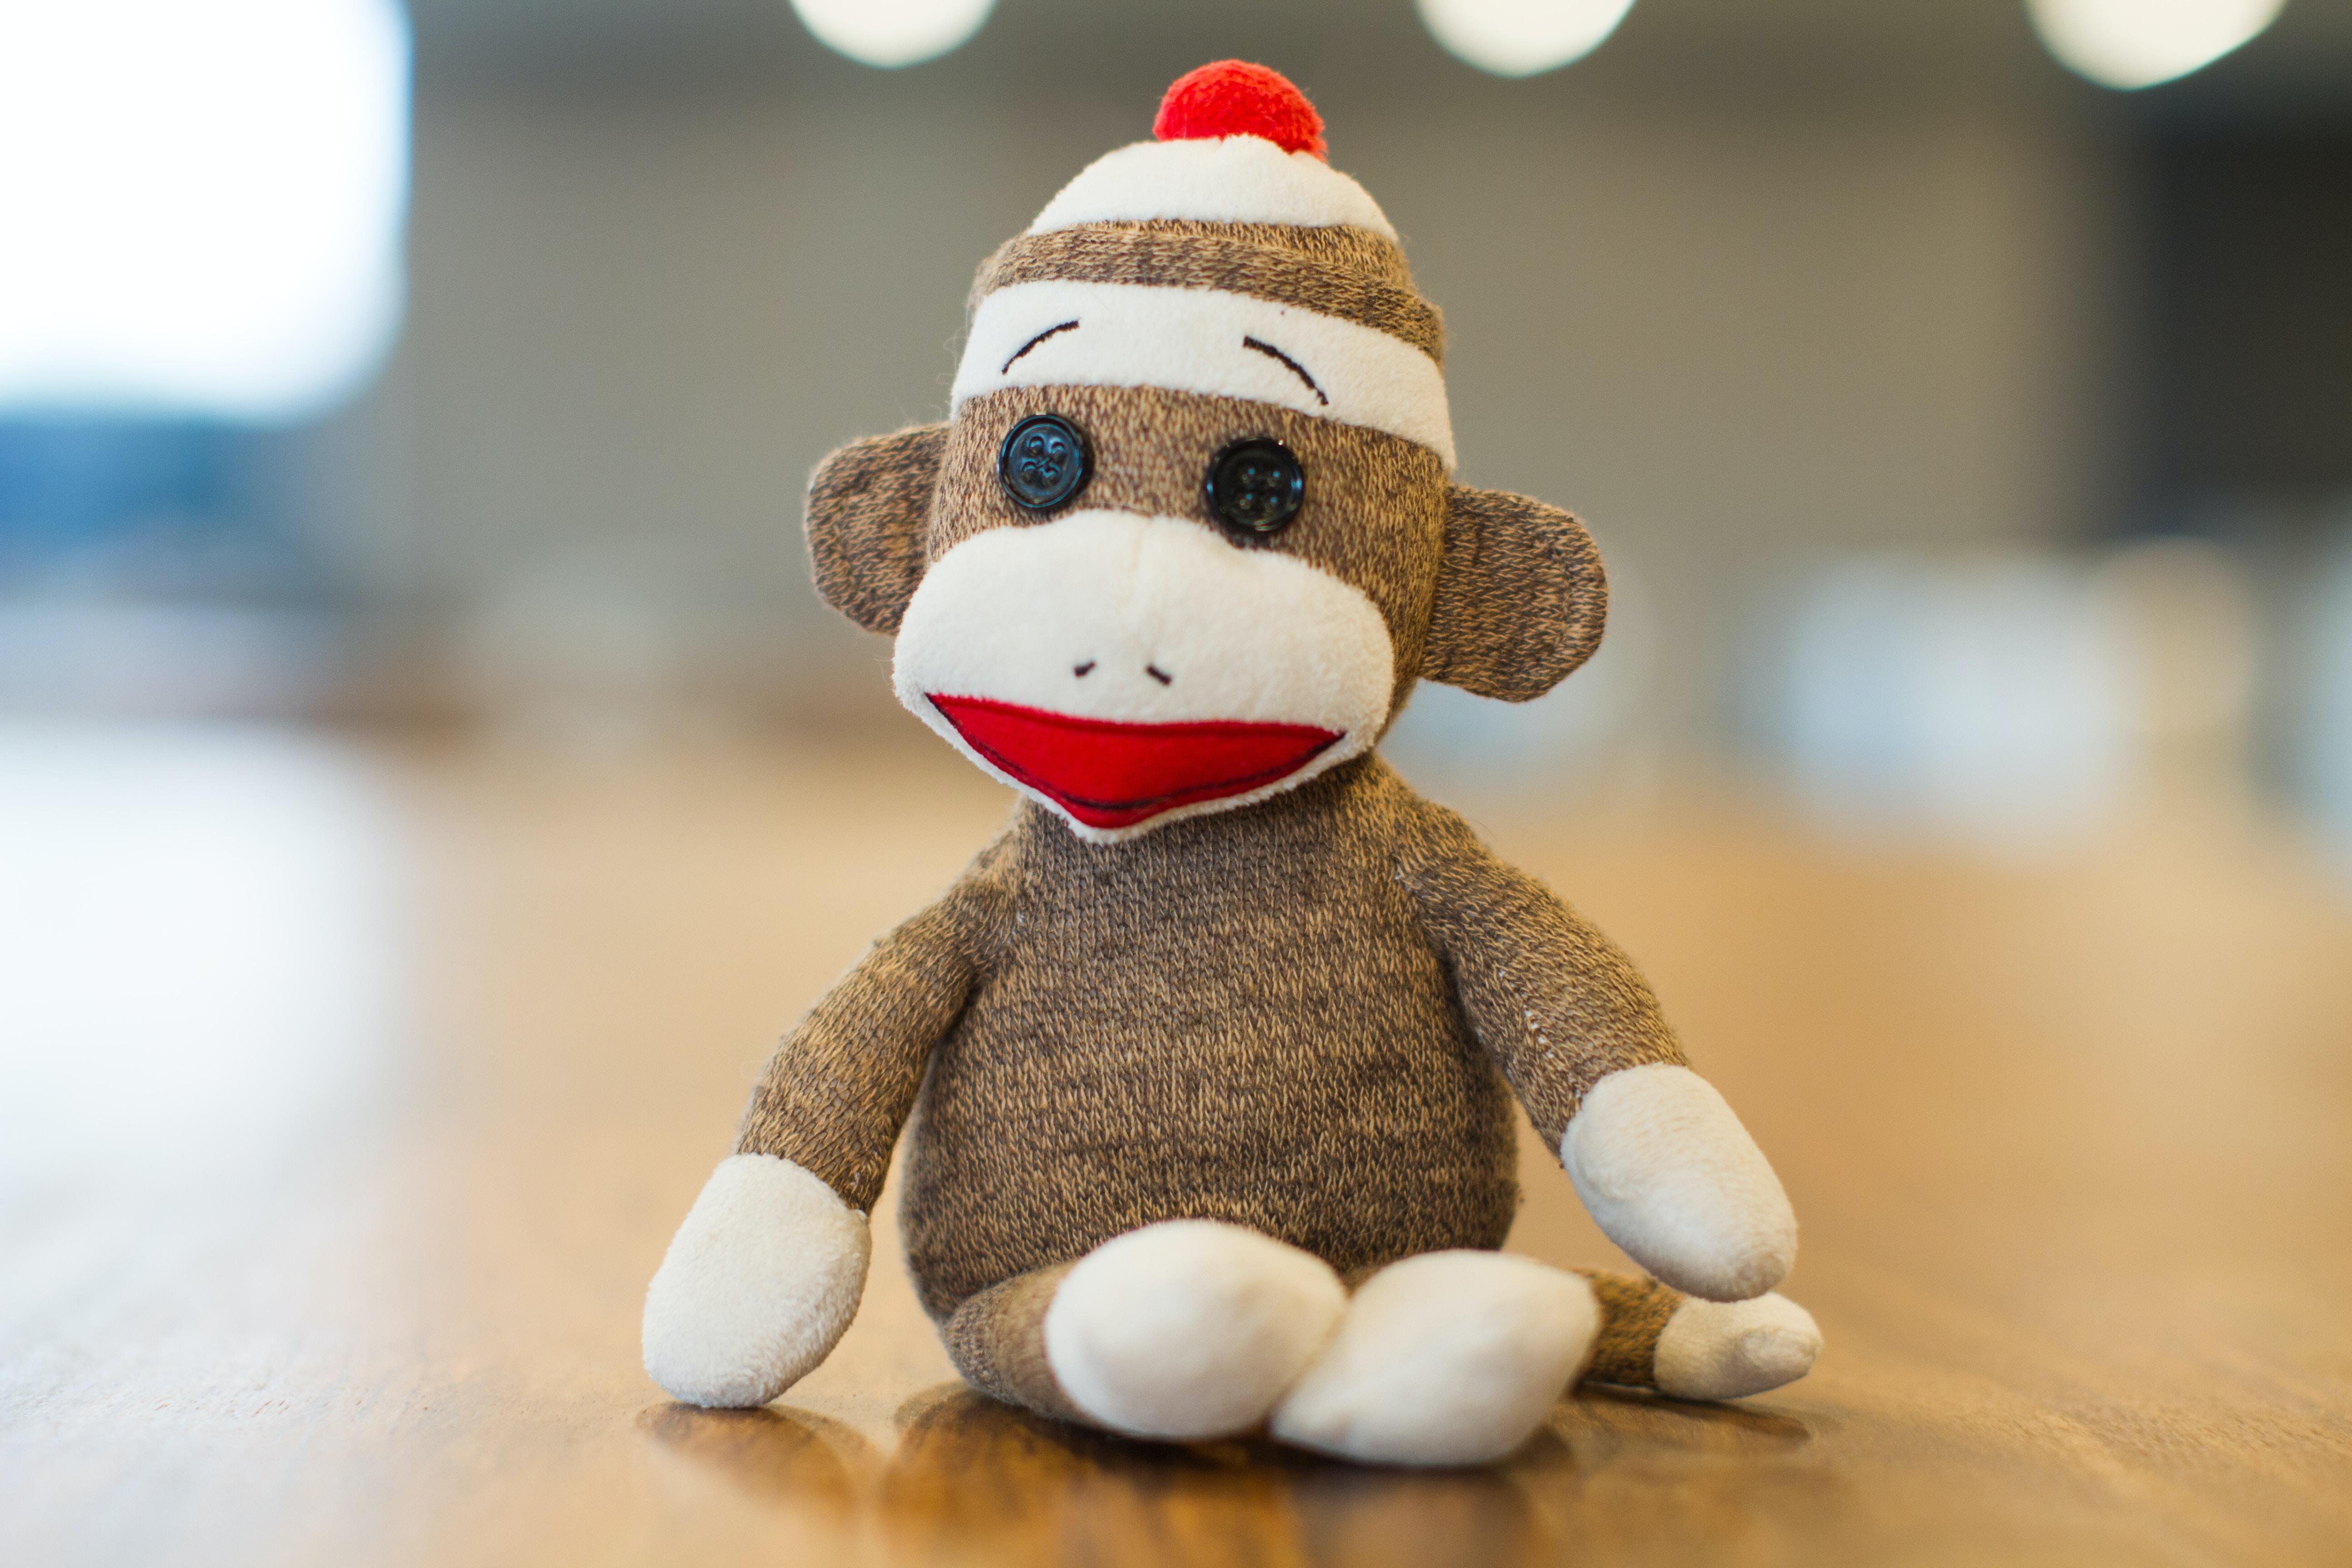 Sock Monkey plush toy on brown panel